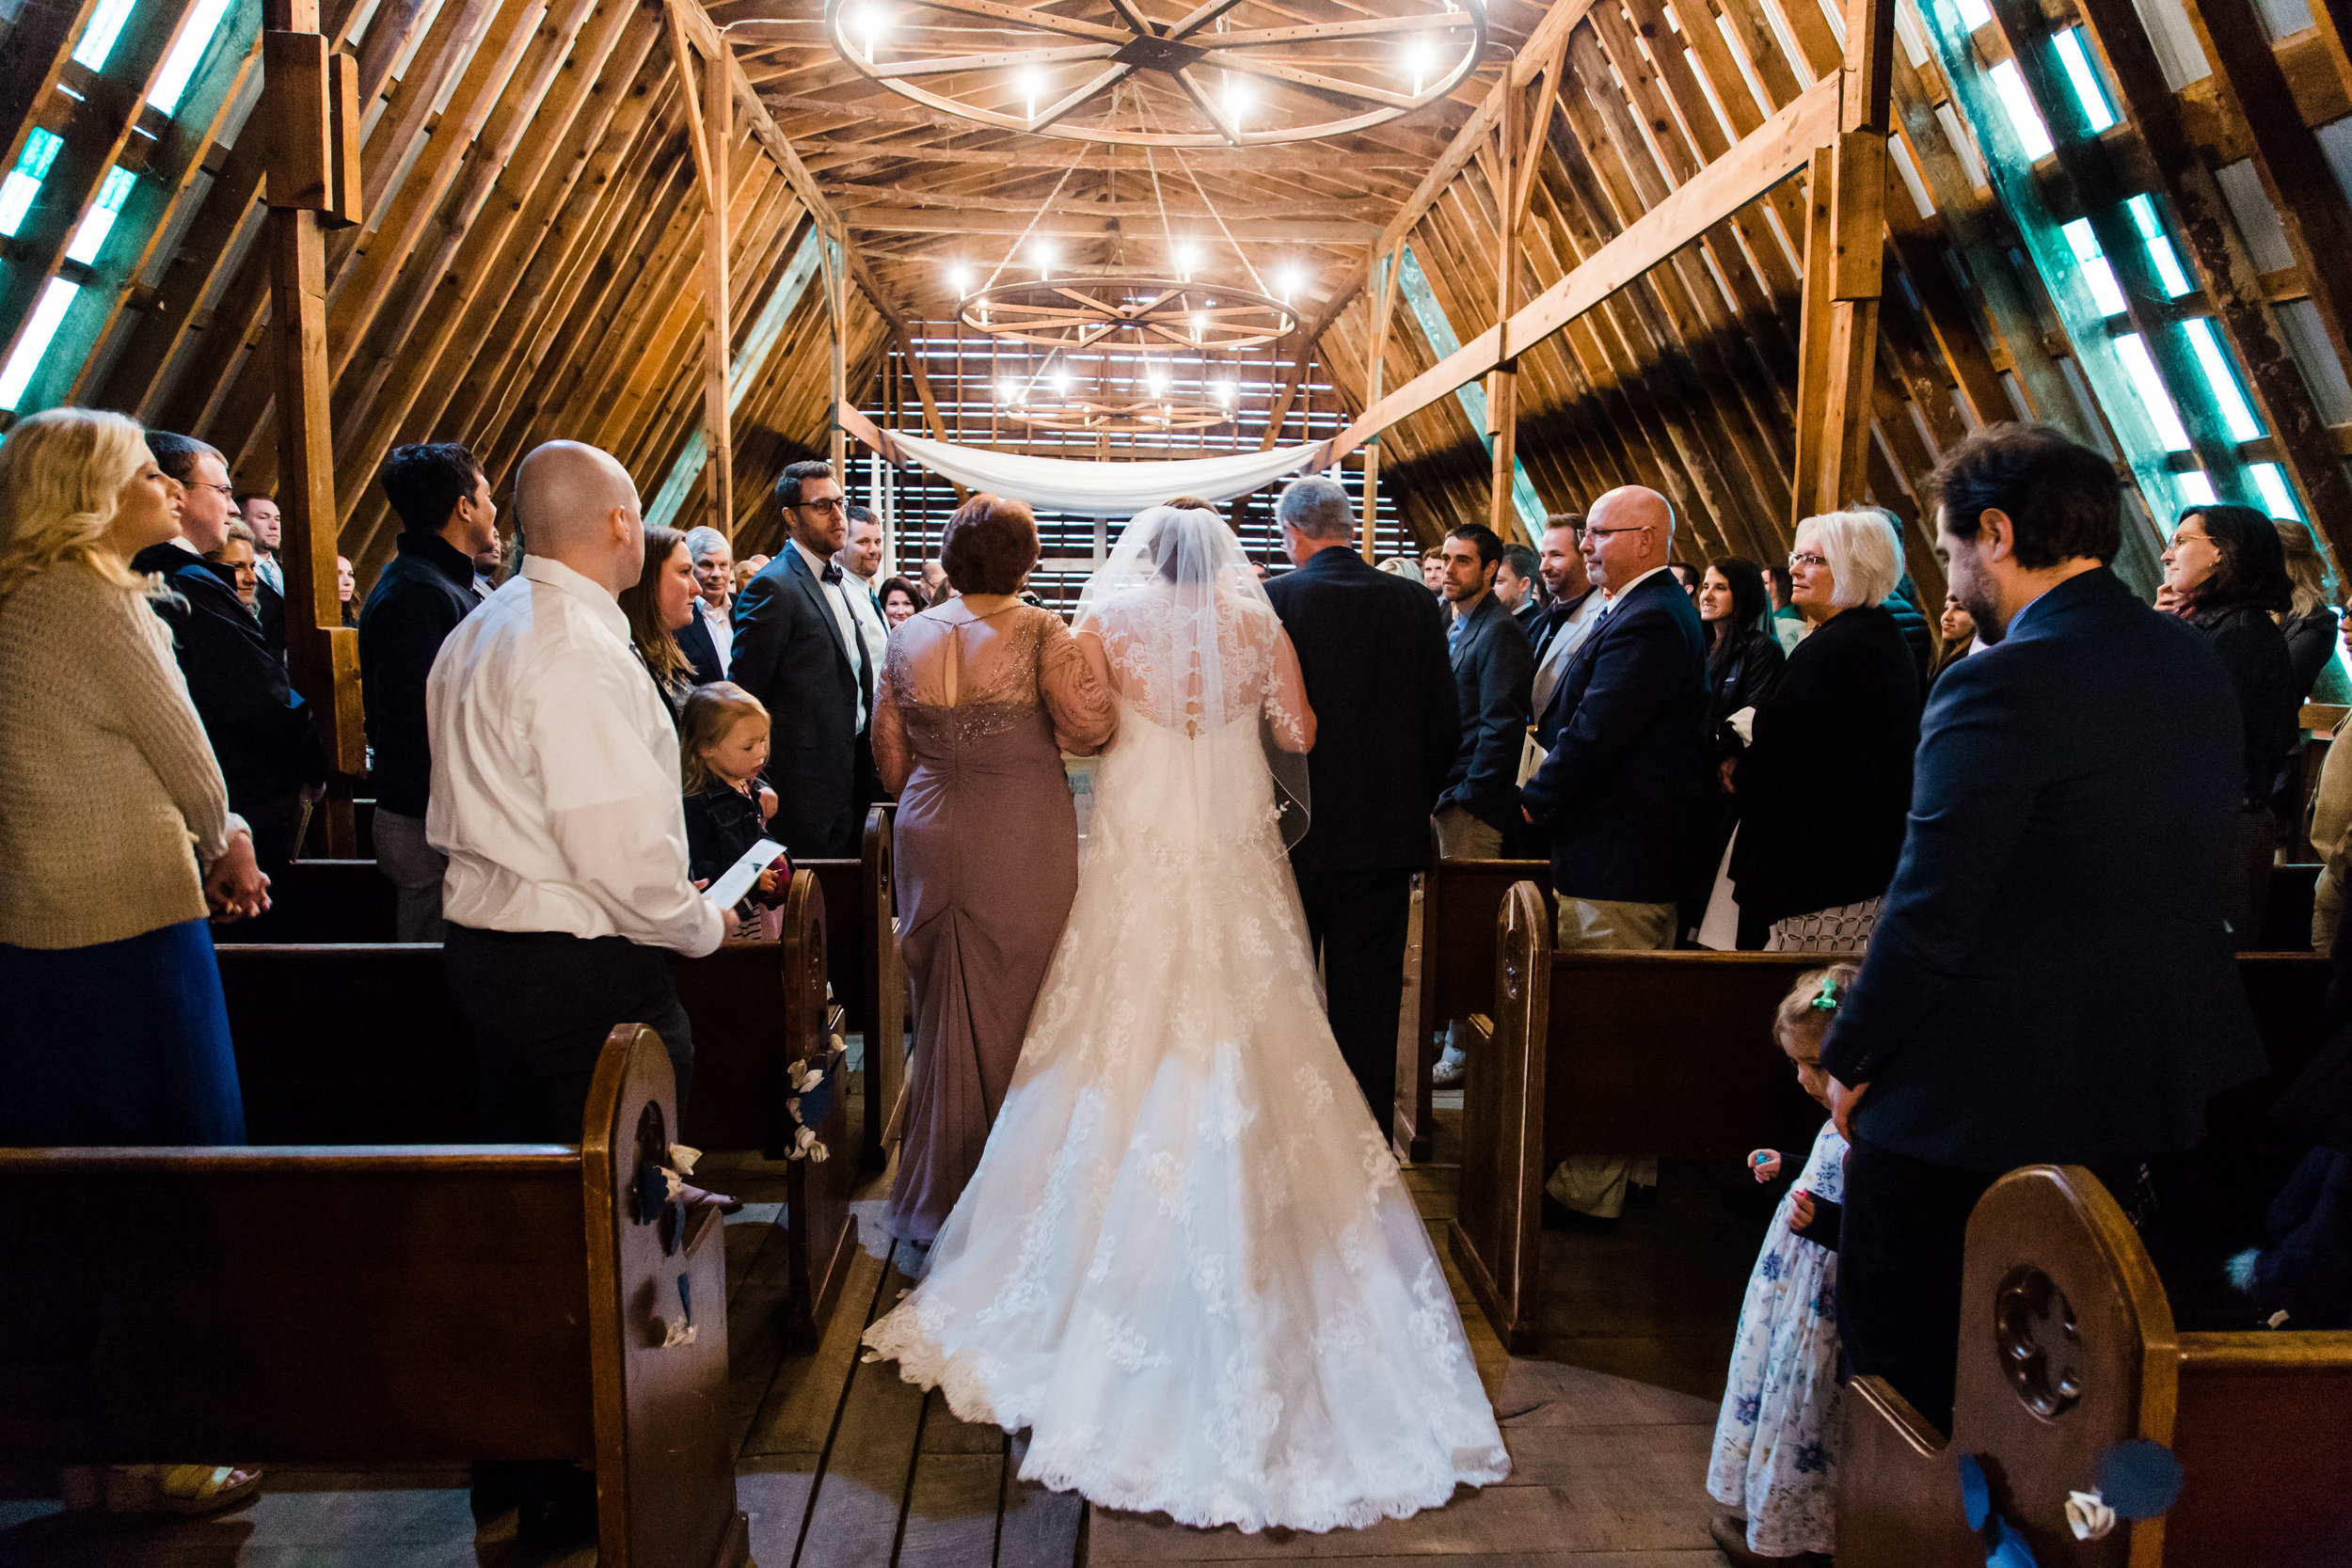 Honeysuckle-Hill-Weddings-Andrew-Rachel-183.jpg